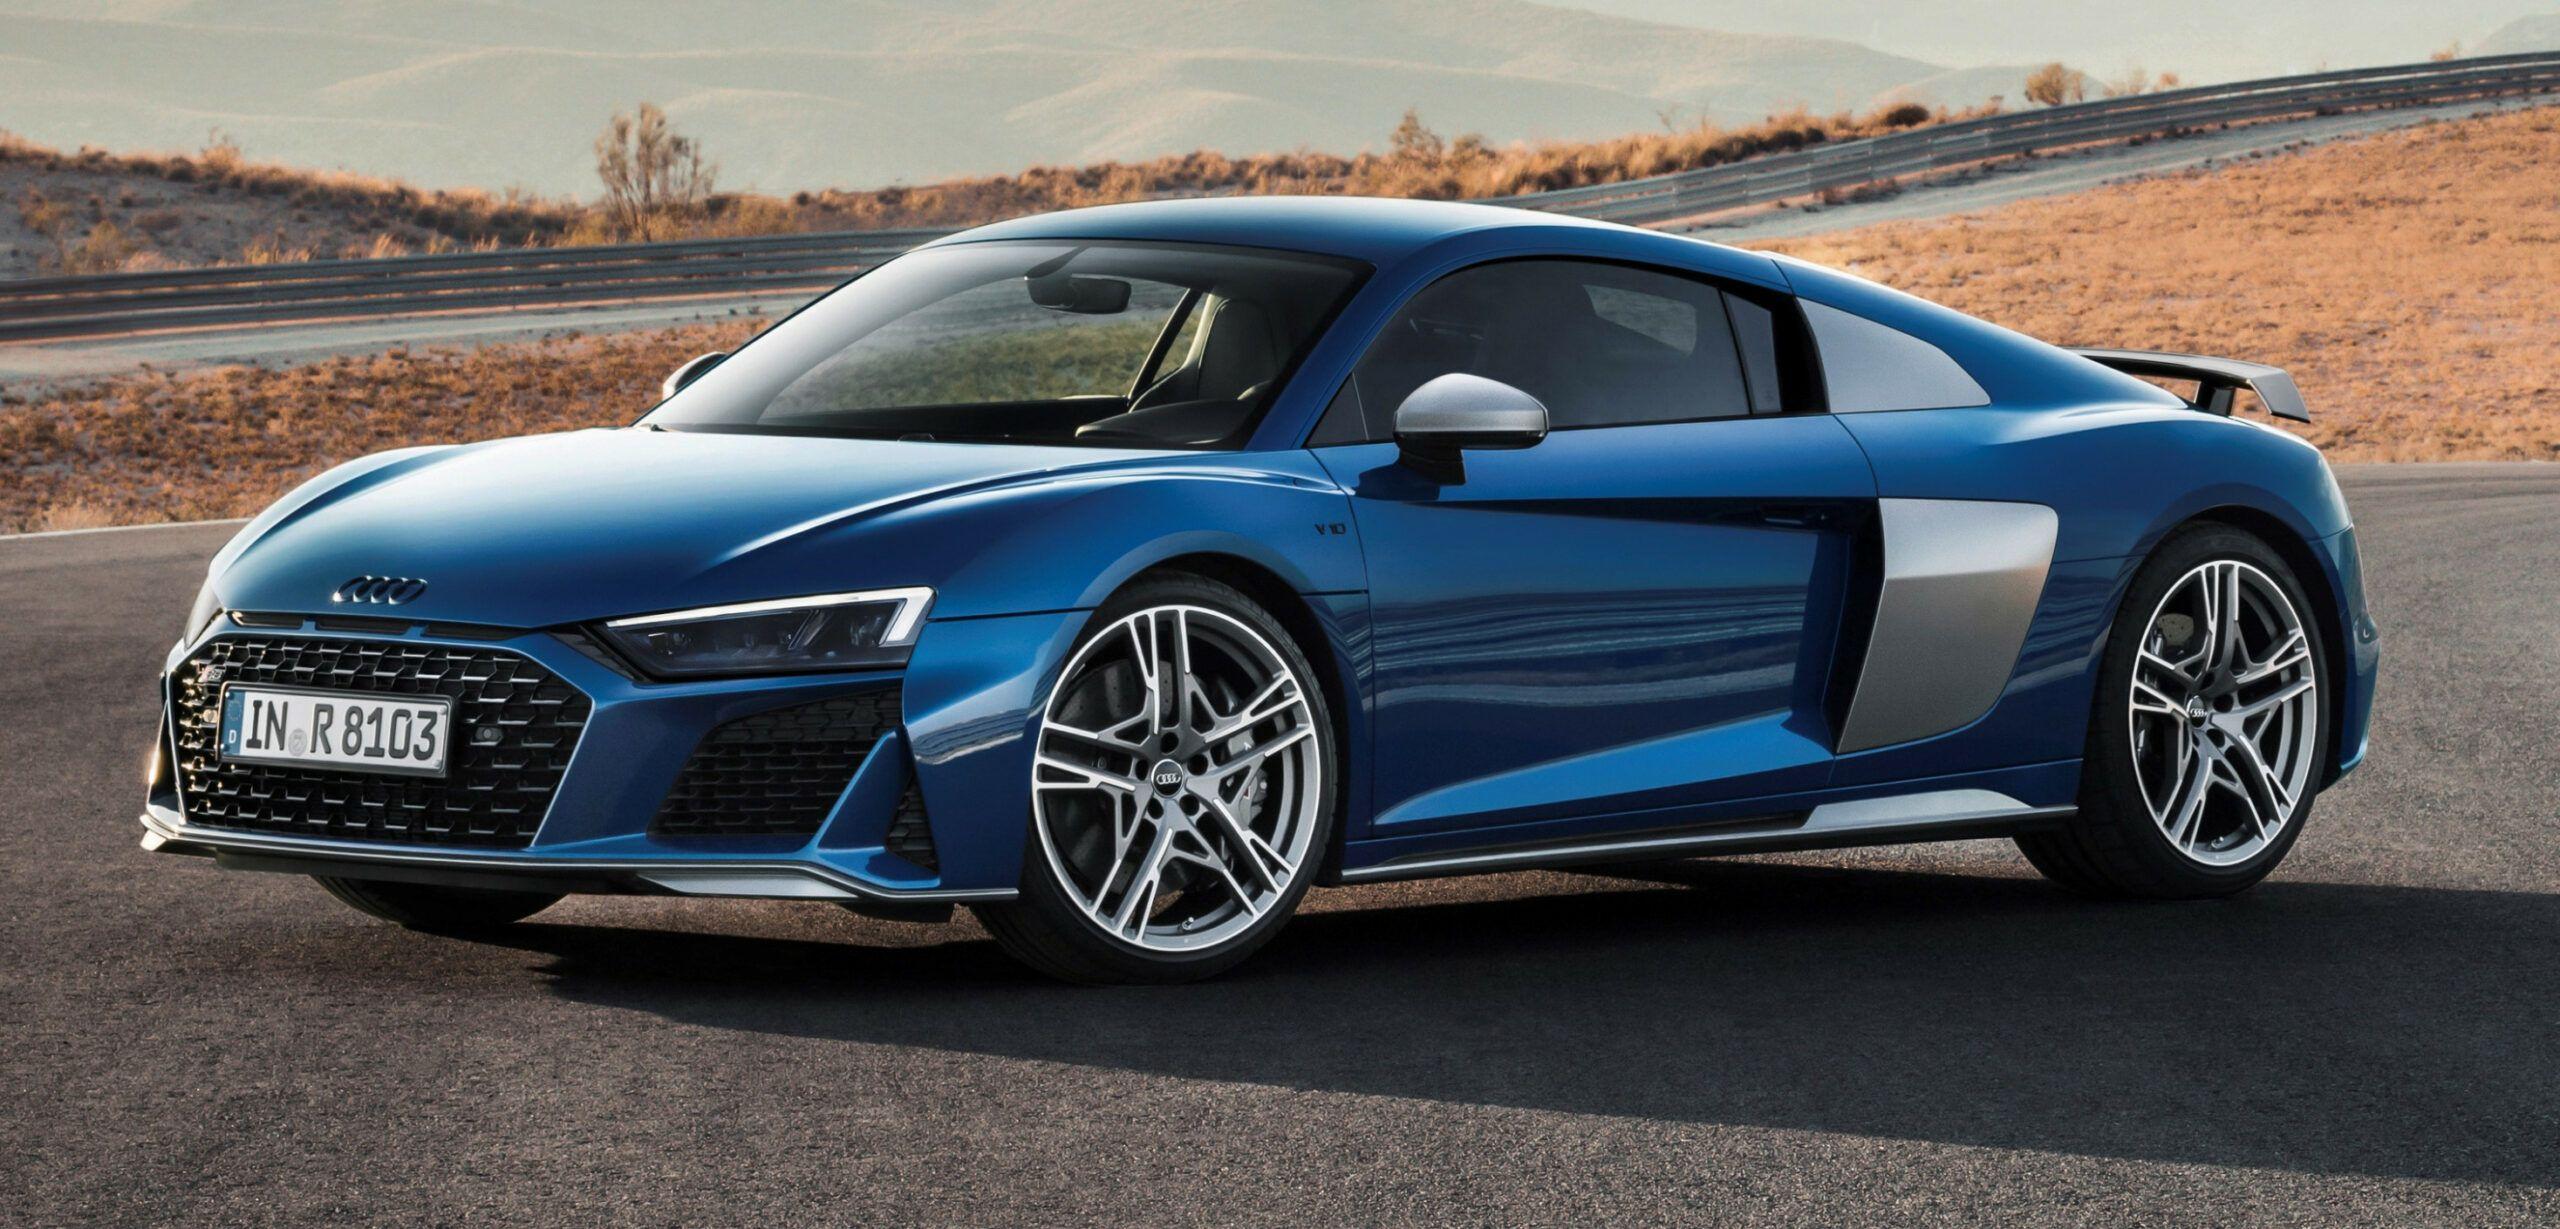 2020 Audi R8 V10 Plus In 2020 Audi Sport Audi R8 V10 Audi R8 V10 Plus